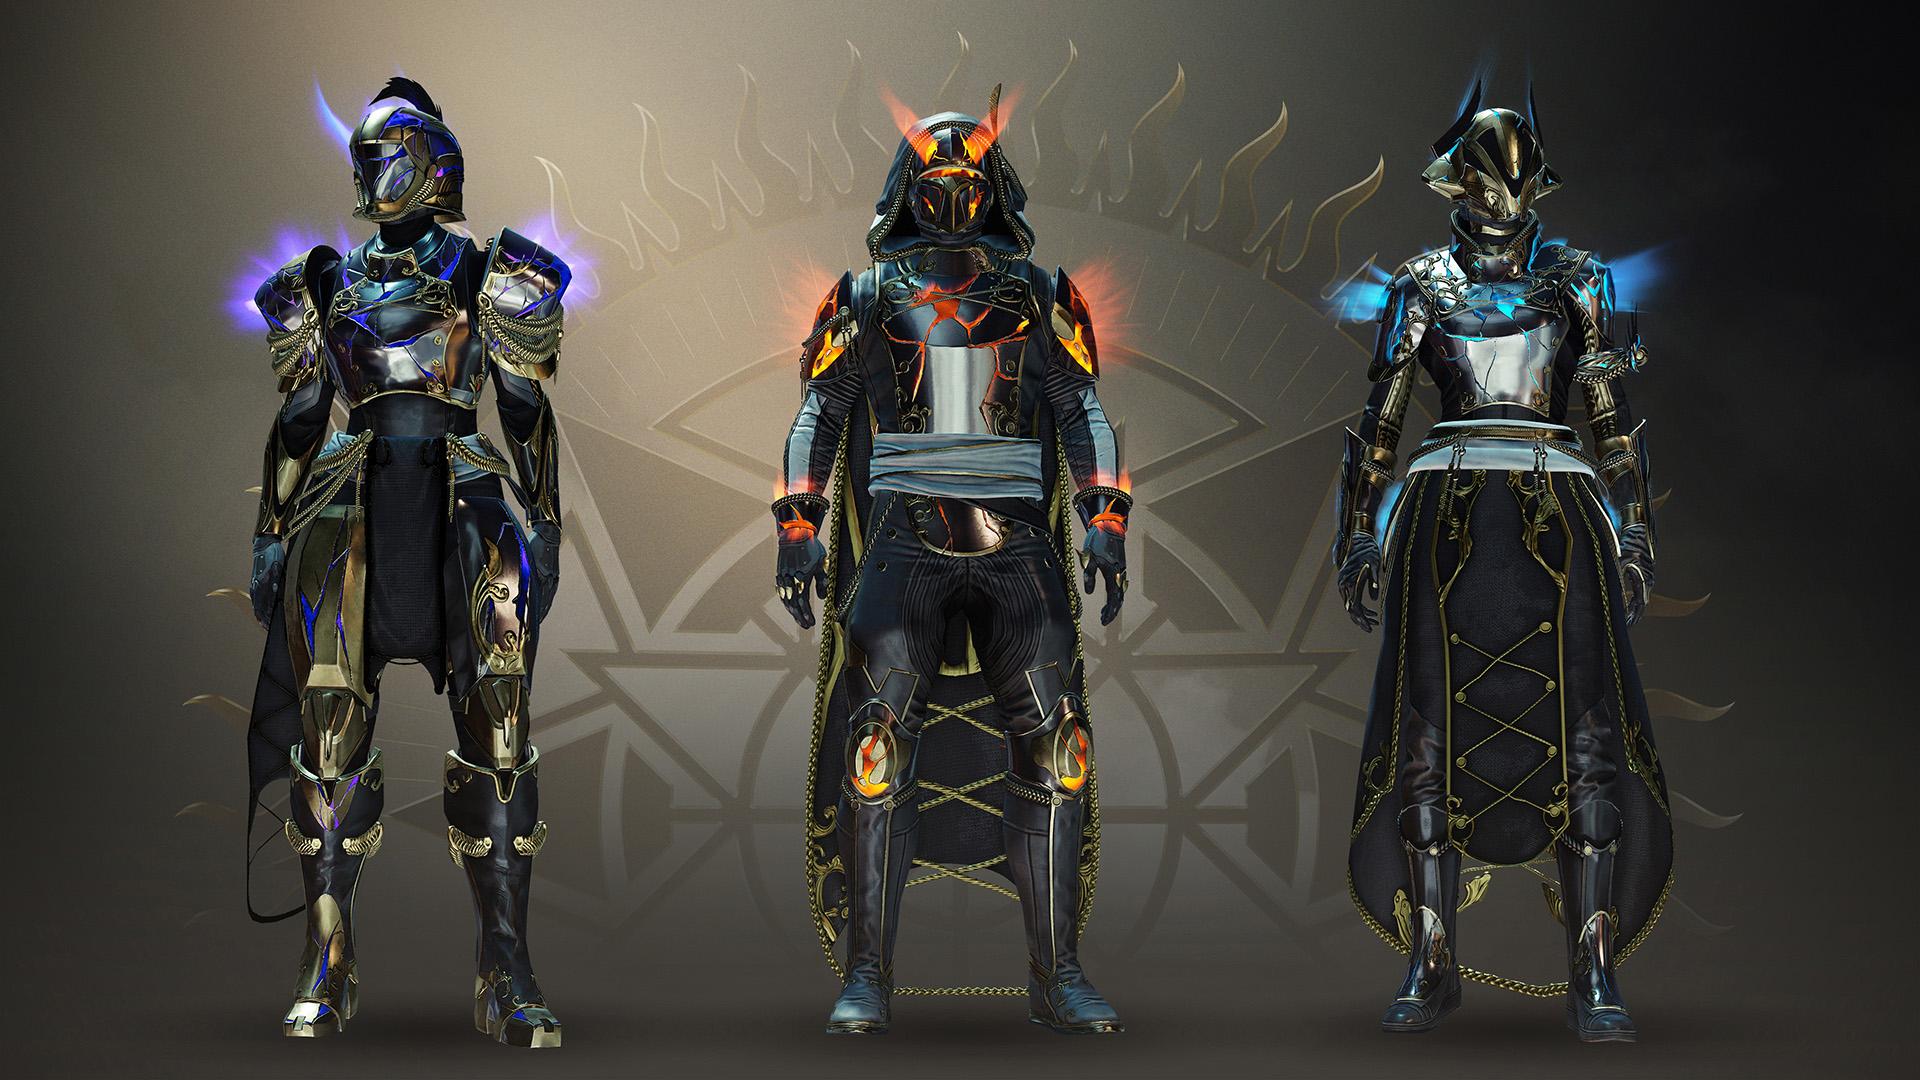 solstice of heroes armor 2020 requirements destiny 2